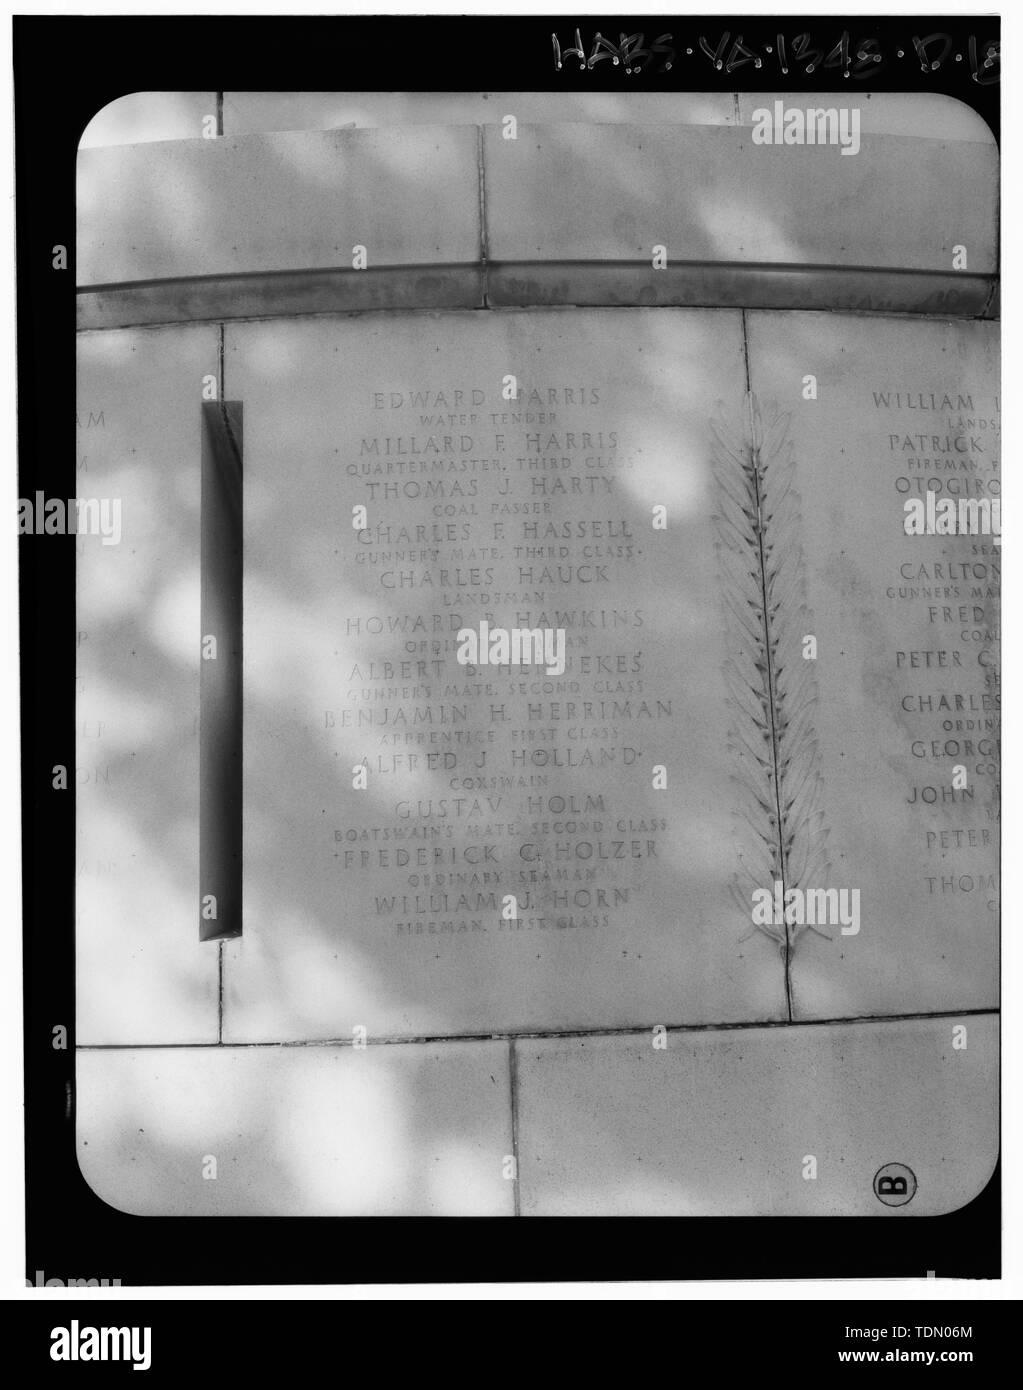 Panel 8 - Arlington National Cemetery, USS Maine Memorial, Arlington, Arlington County, VA; U.S. Army Corps of Engineers; Wyeth, Nathan C; Black, William M; Patrick, Mason M; Ferguson, H B; Bixby, W H; Goodson, W F; Lackawanna Steel Company; T.L. Huston Construction Company; Harris Brothers; Clark, D Lombillo; Primelles, Arturo; Rhodes, D H; Jenkins, Oliver B; Tilford, James D; Aleshire, J B; Stimson, H E; Scofield, John J; Hugh, R P; Houston, J B; Sharpe, Henry G; Downey, G F; Clem, L; Cosby, Spencer; Taft, William Howard; Commission of Fine Arts; Olmsted, Fredrick Law; French, Daniel Chester - Stock Image